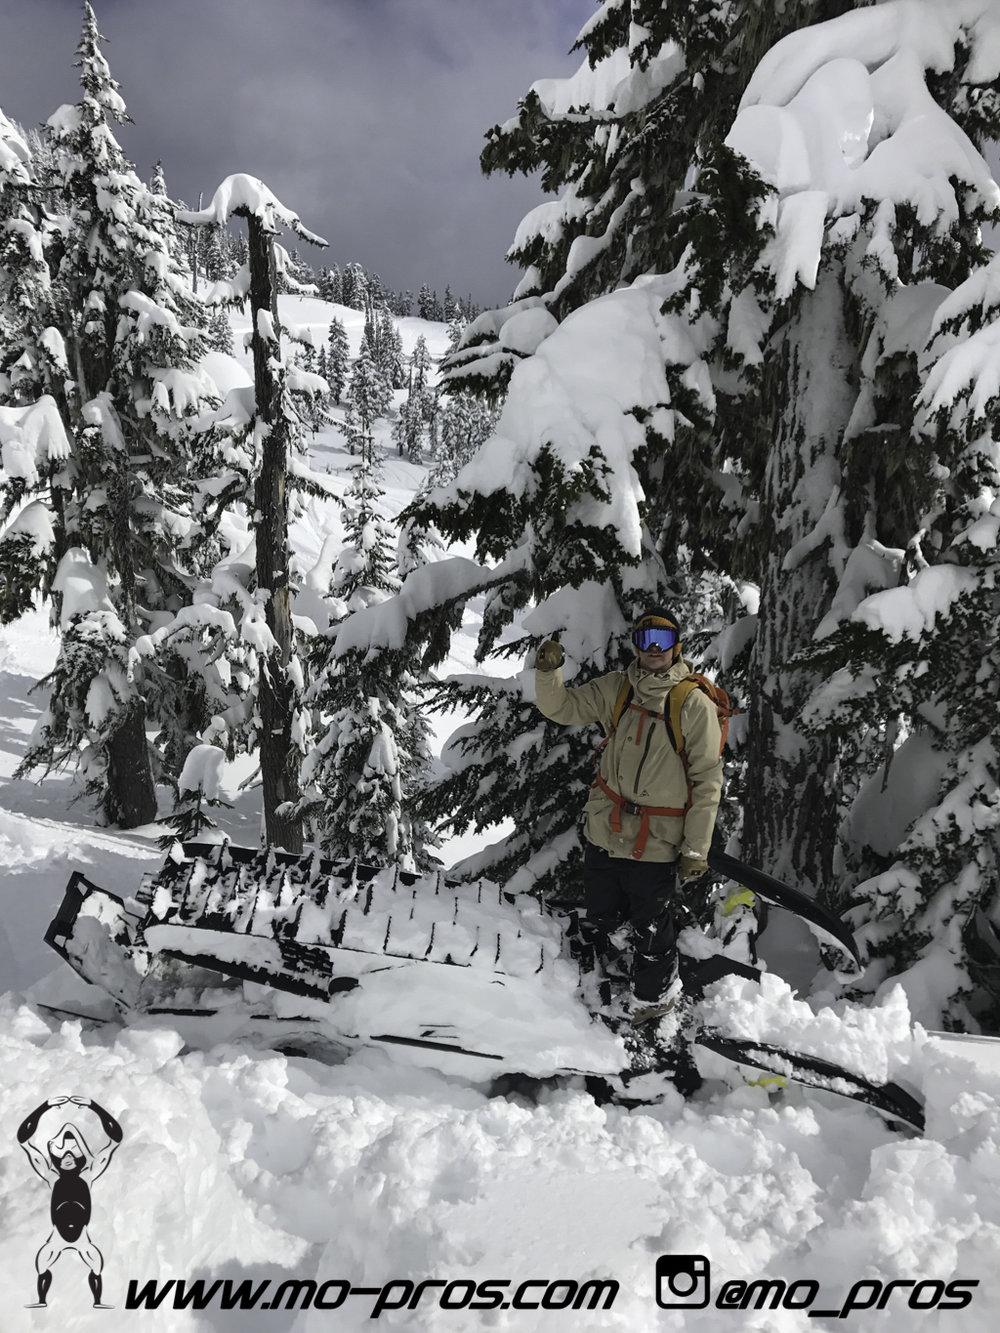 68_CFR rack_Cheetah Factory Racing_Snowboard rack_snowboard_snowmobile bag_Snowmobile_timbersled bag_gas Rack_Gear_Gun Rack_LinQ Snowboard Ski_Ski_Snowbike_Timbersled Rack_Tsaina Rack_Snowboarding_Ti.jpg